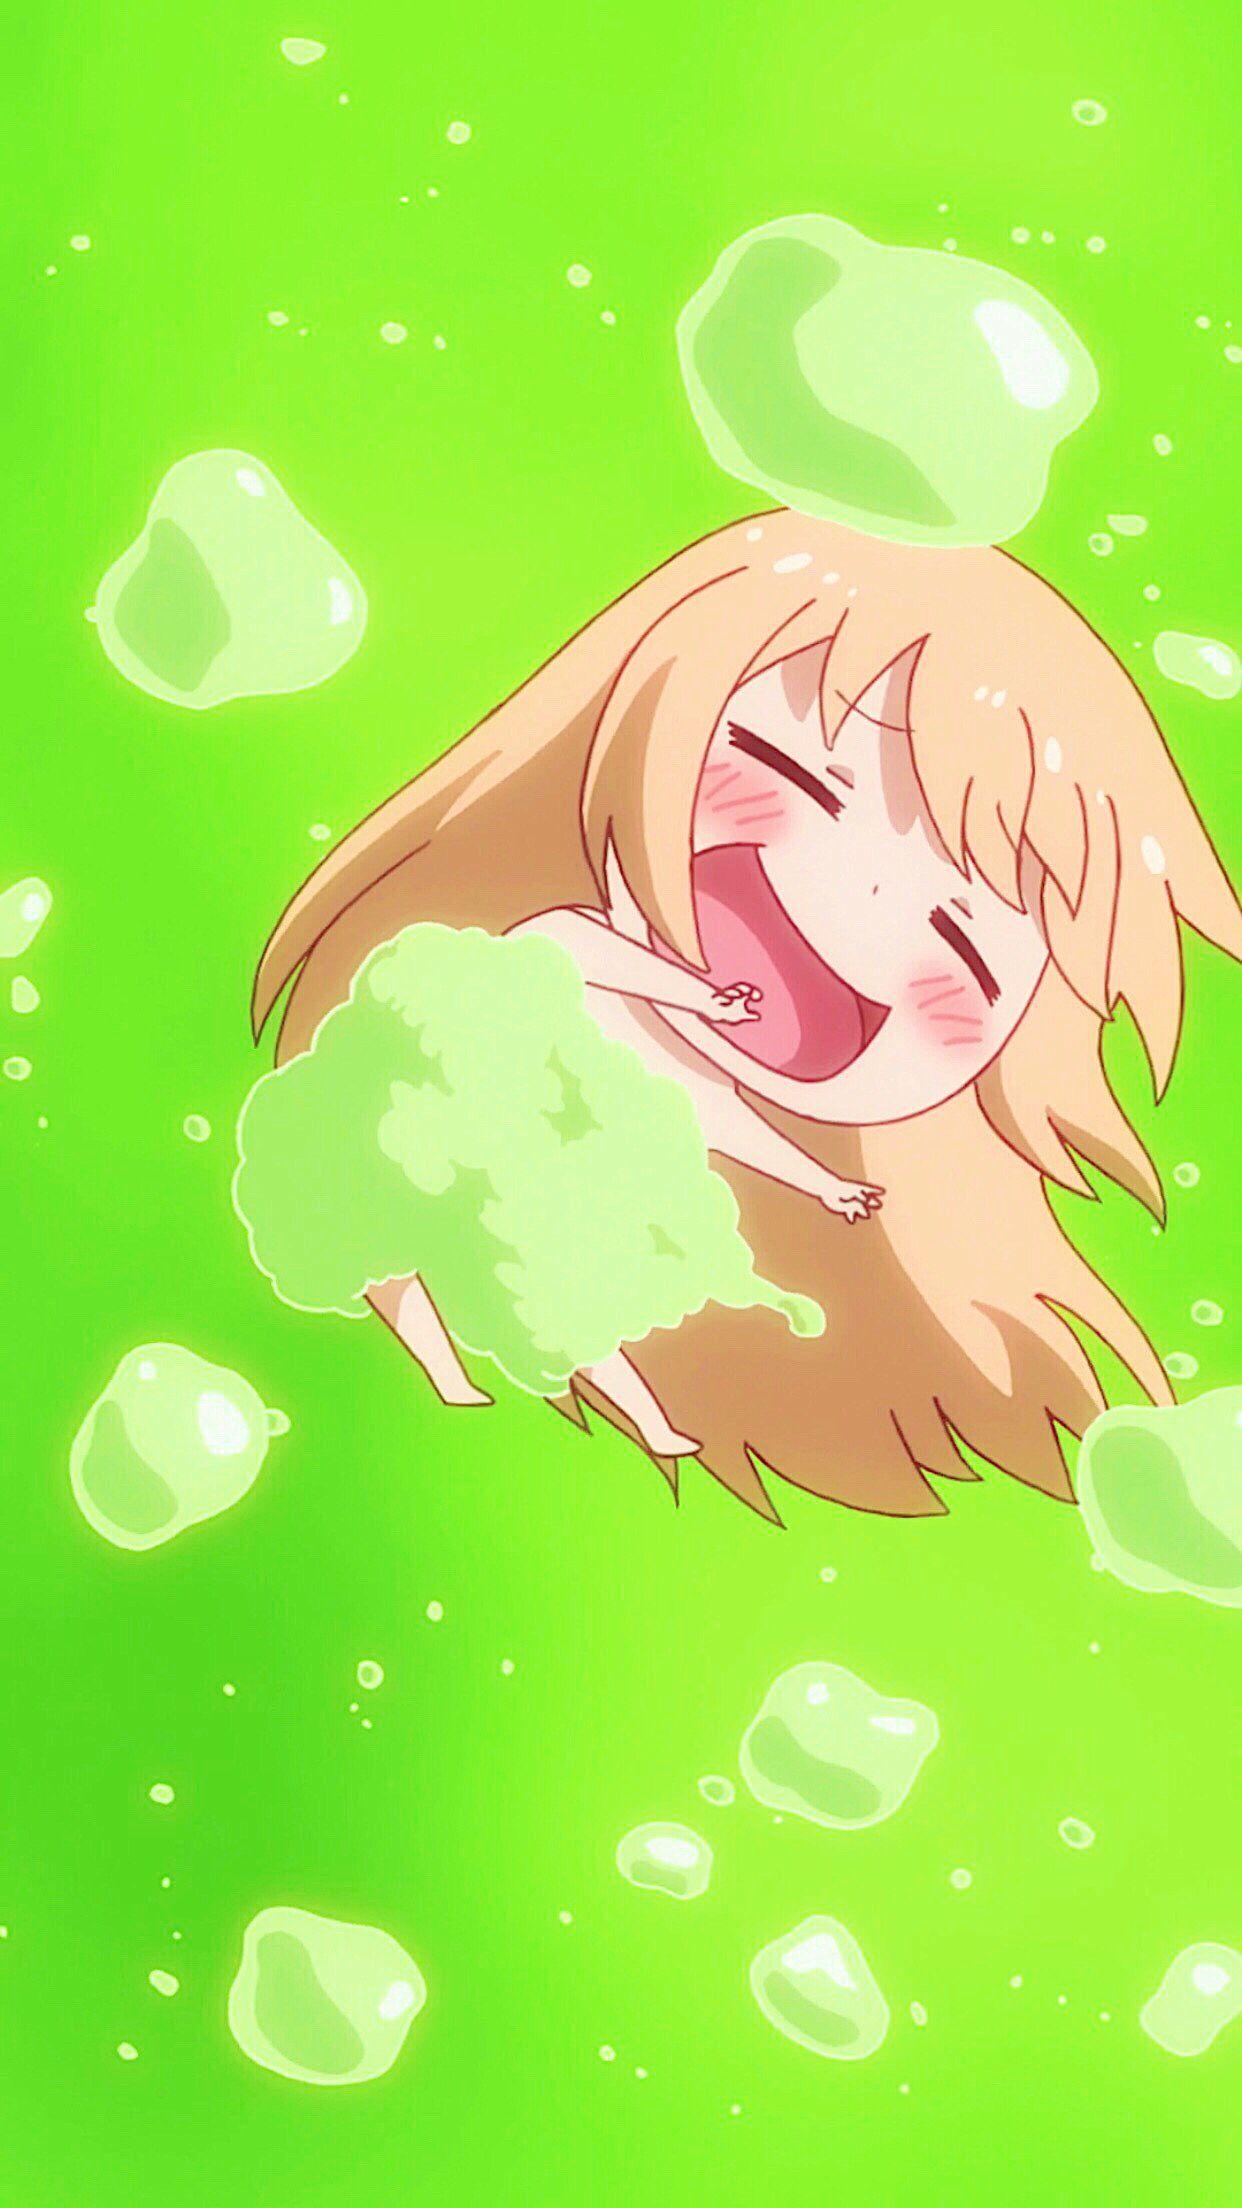 Umaruchan Desenhos kawaii tumblr, Anime, Desenhos kawaii